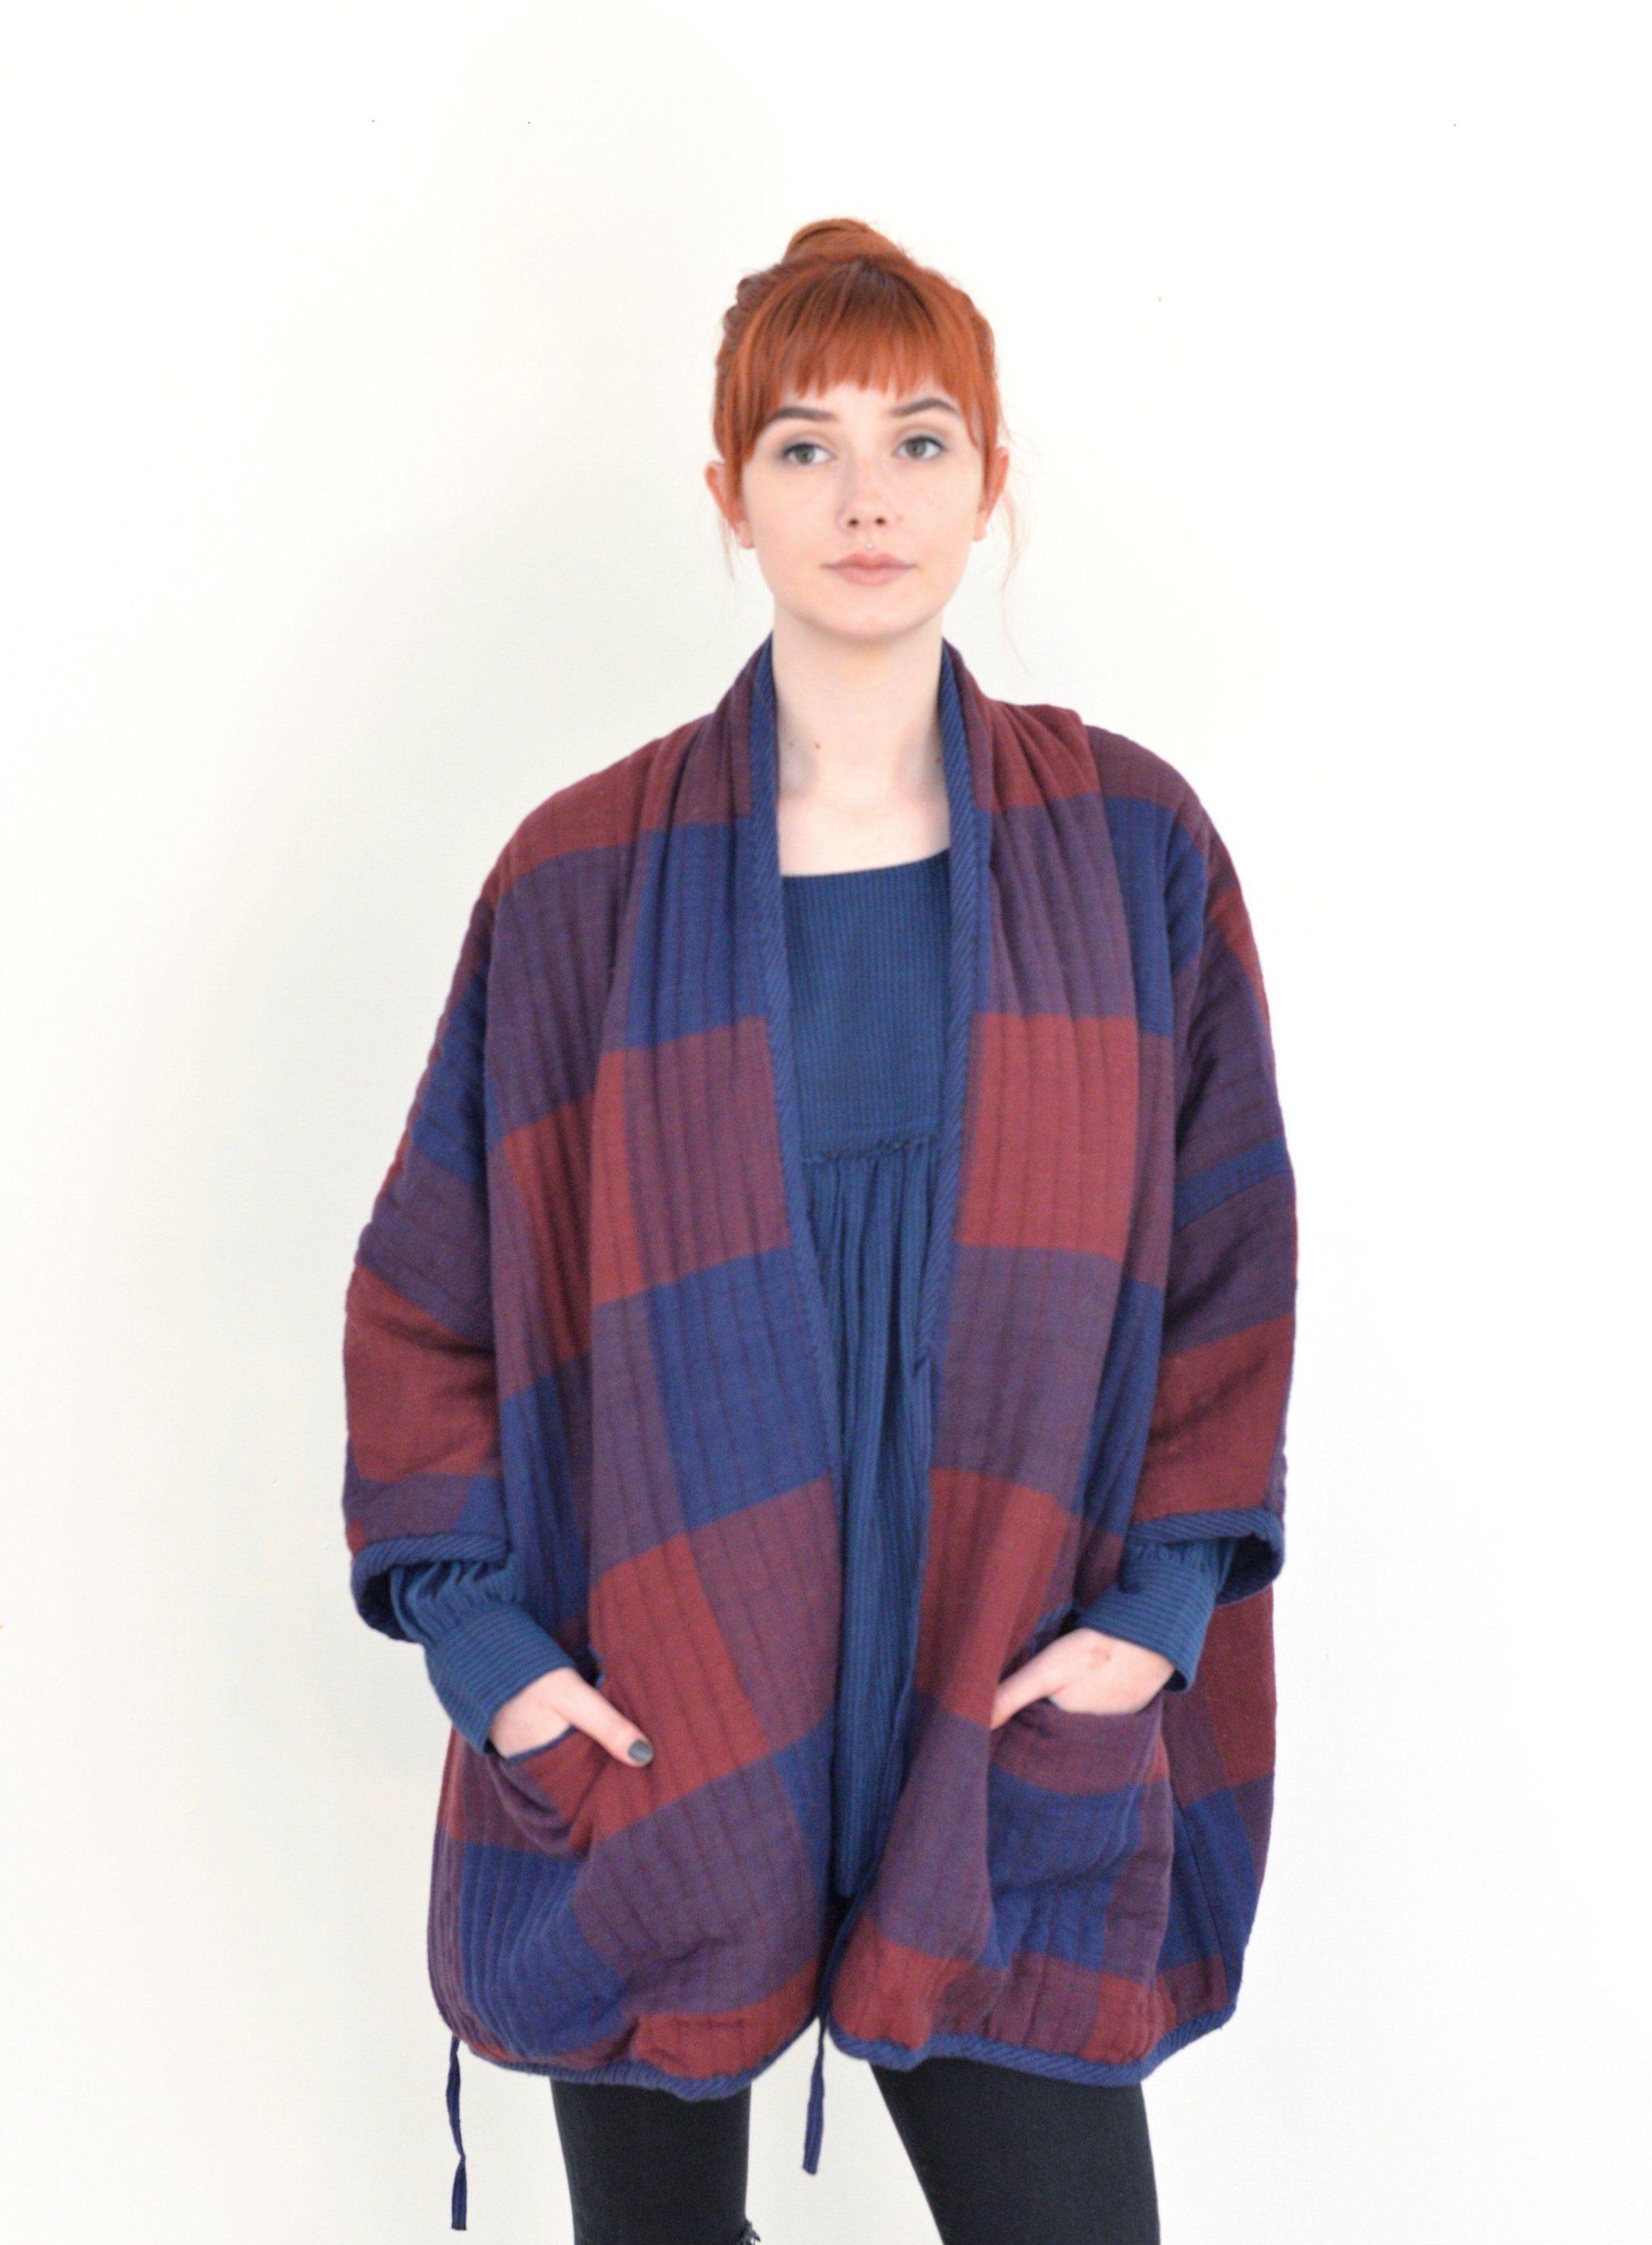 Maroc quilted kimono jacket | Kimono jacket and Products : quilted kimono jacket - Adamdwight.com